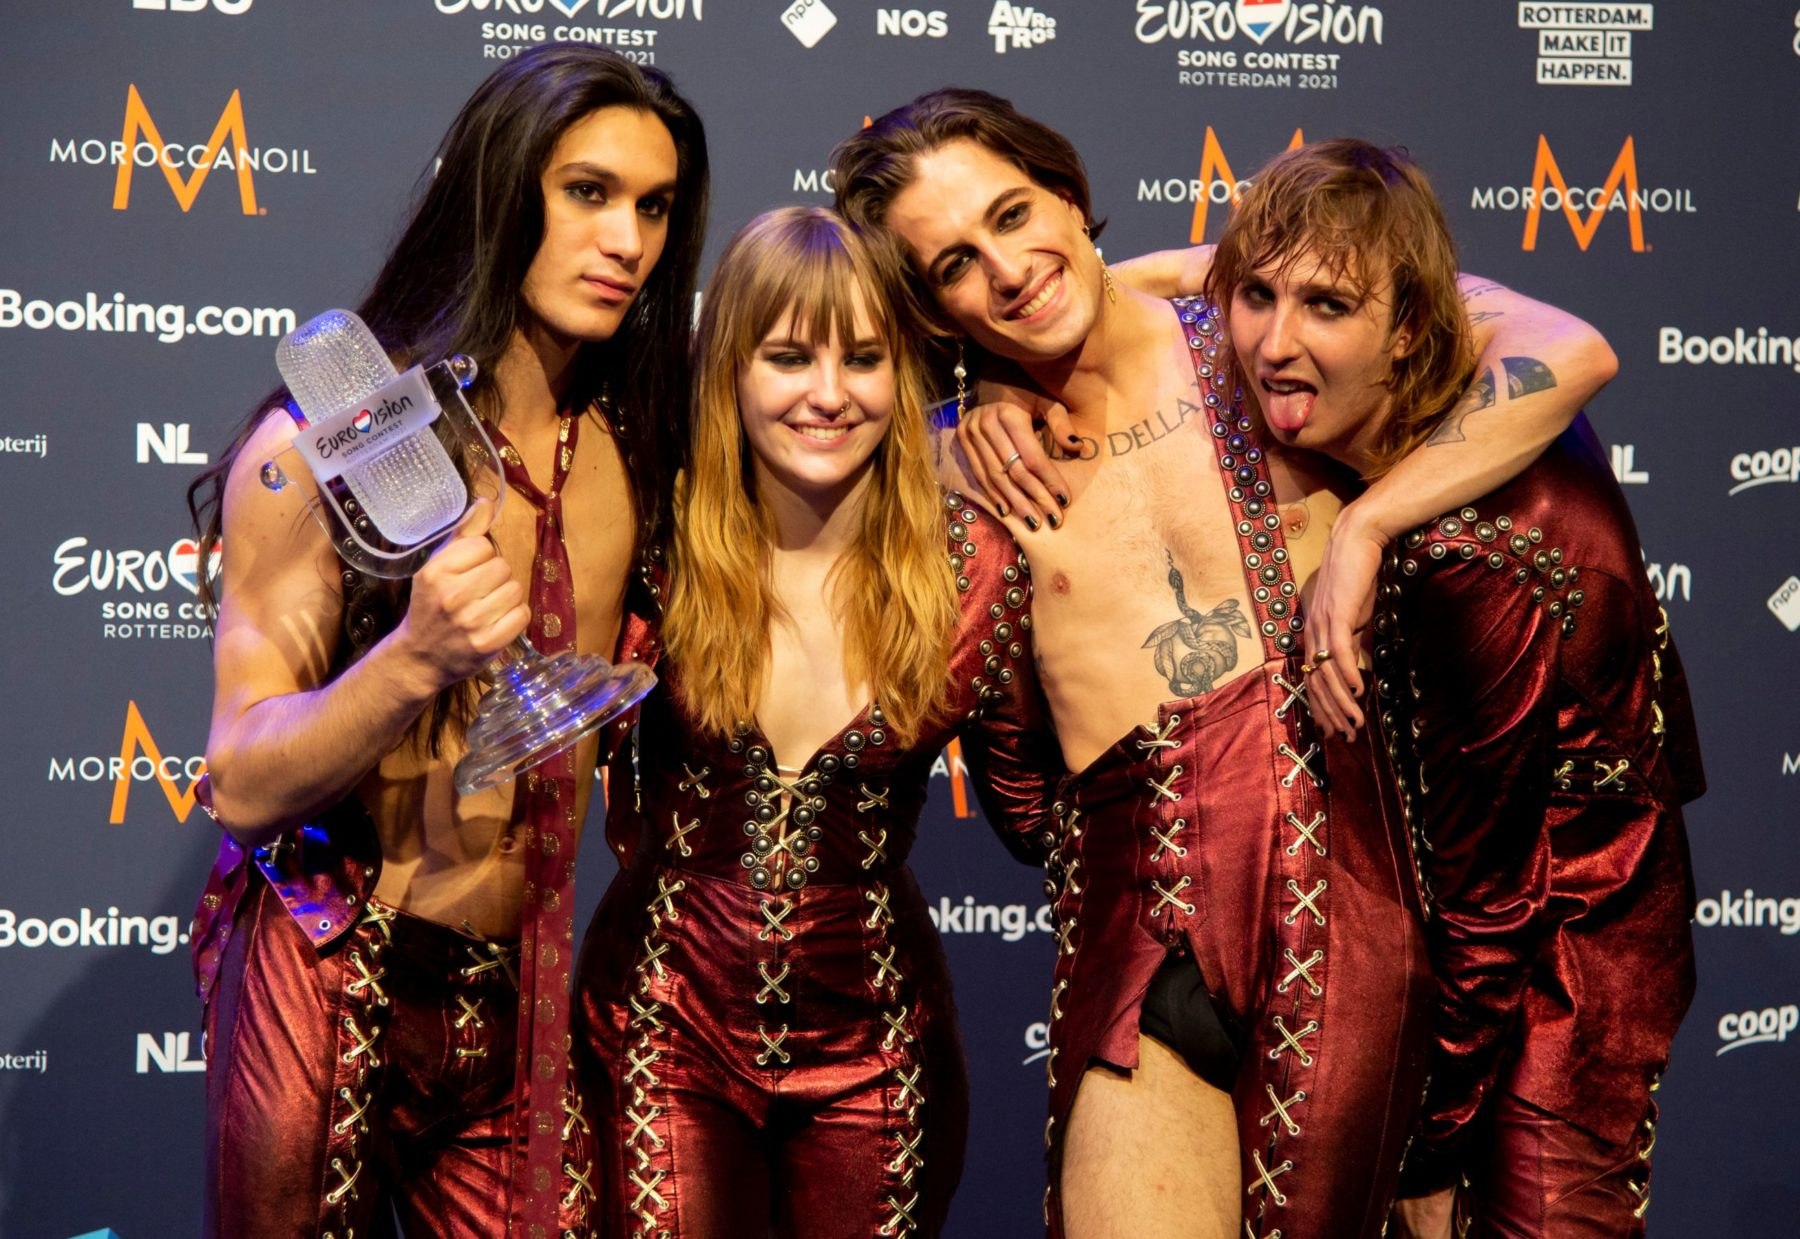 Eurovision 2021 - Maneskin: «Είναι σαν να ακύρωσαν την εμφάνισή μας με αυτές οι φήμες»